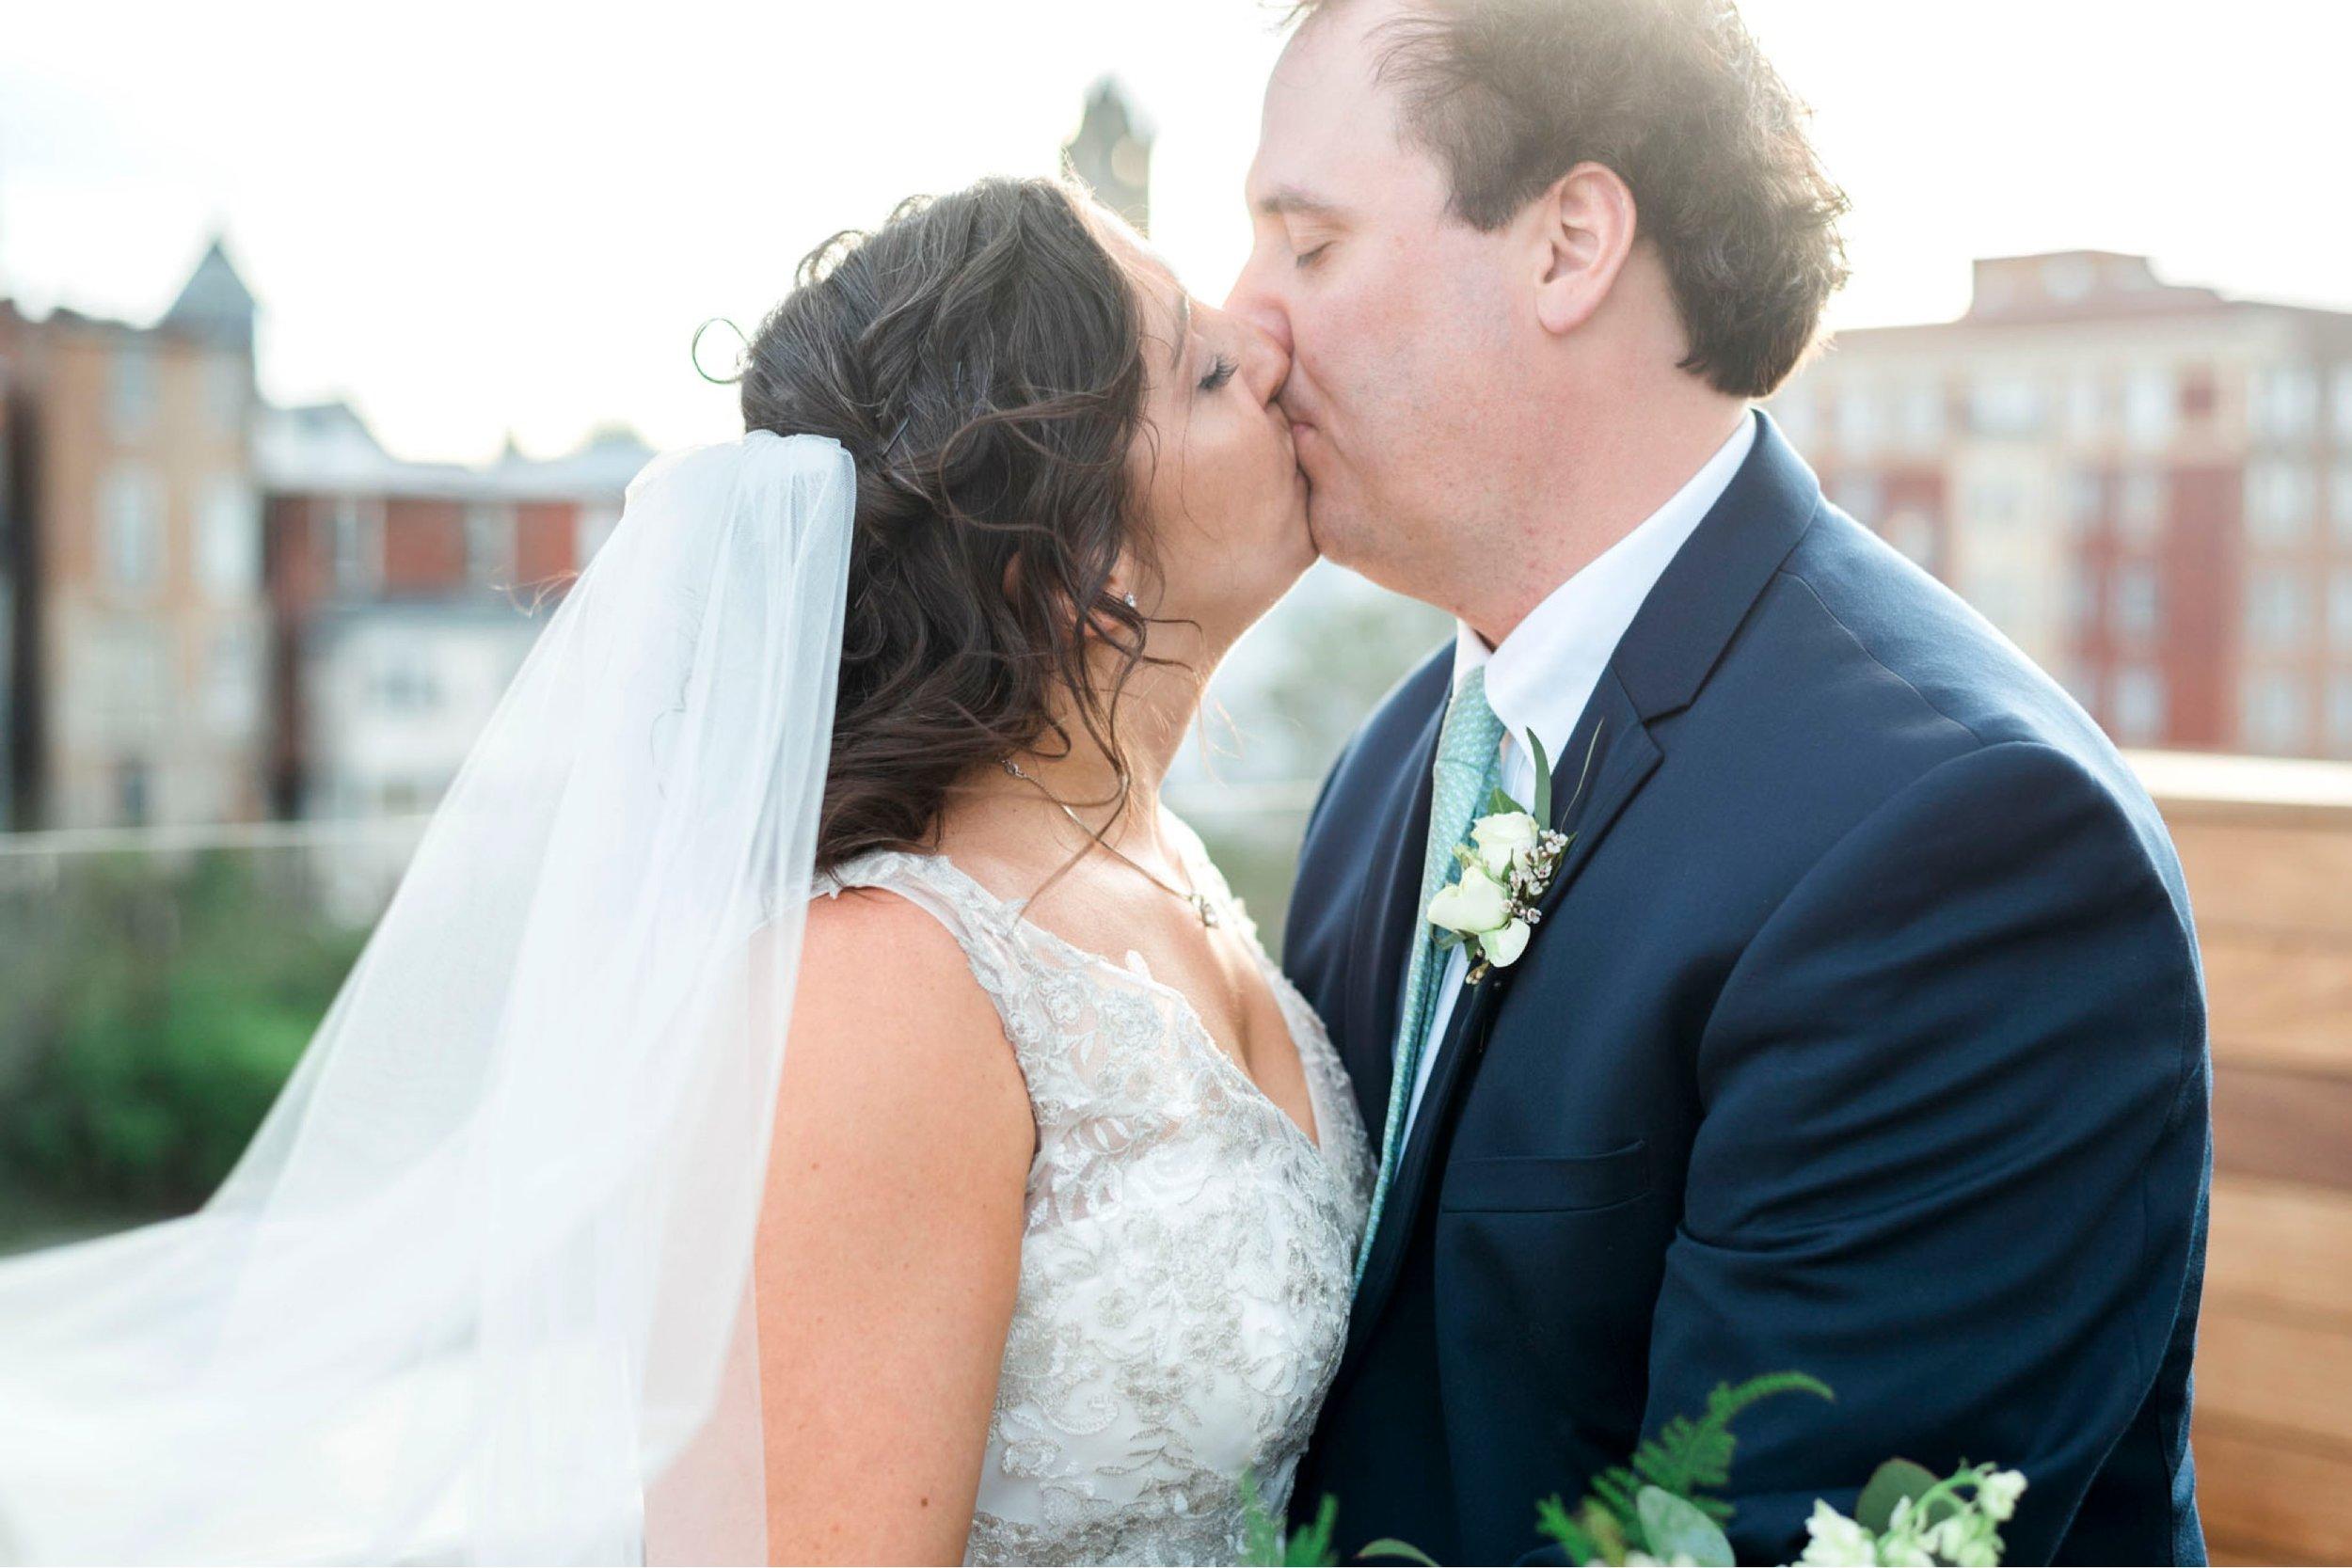 TheVirginianHotel_LynchburgVA_TheVirginianHotelWedding_Virginiaweddingphotographer_Lynchburgvawedding 9.jpg